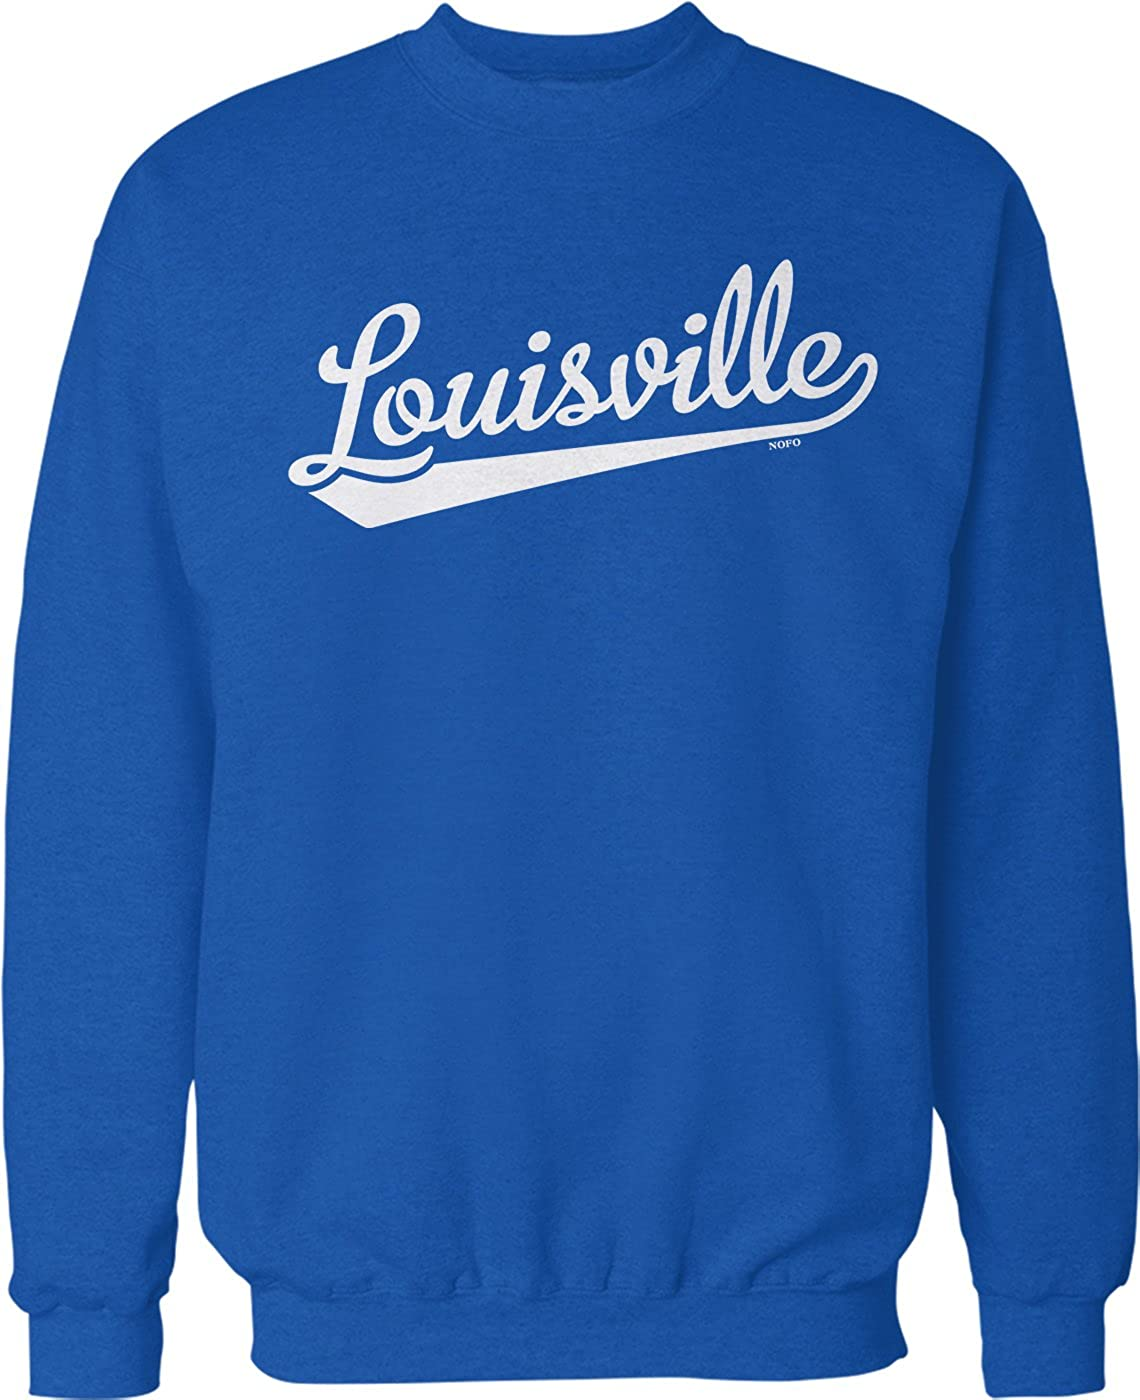 NOFO Clothing Co Louisville Script Baseball Font Crew Neck Sweatshirt